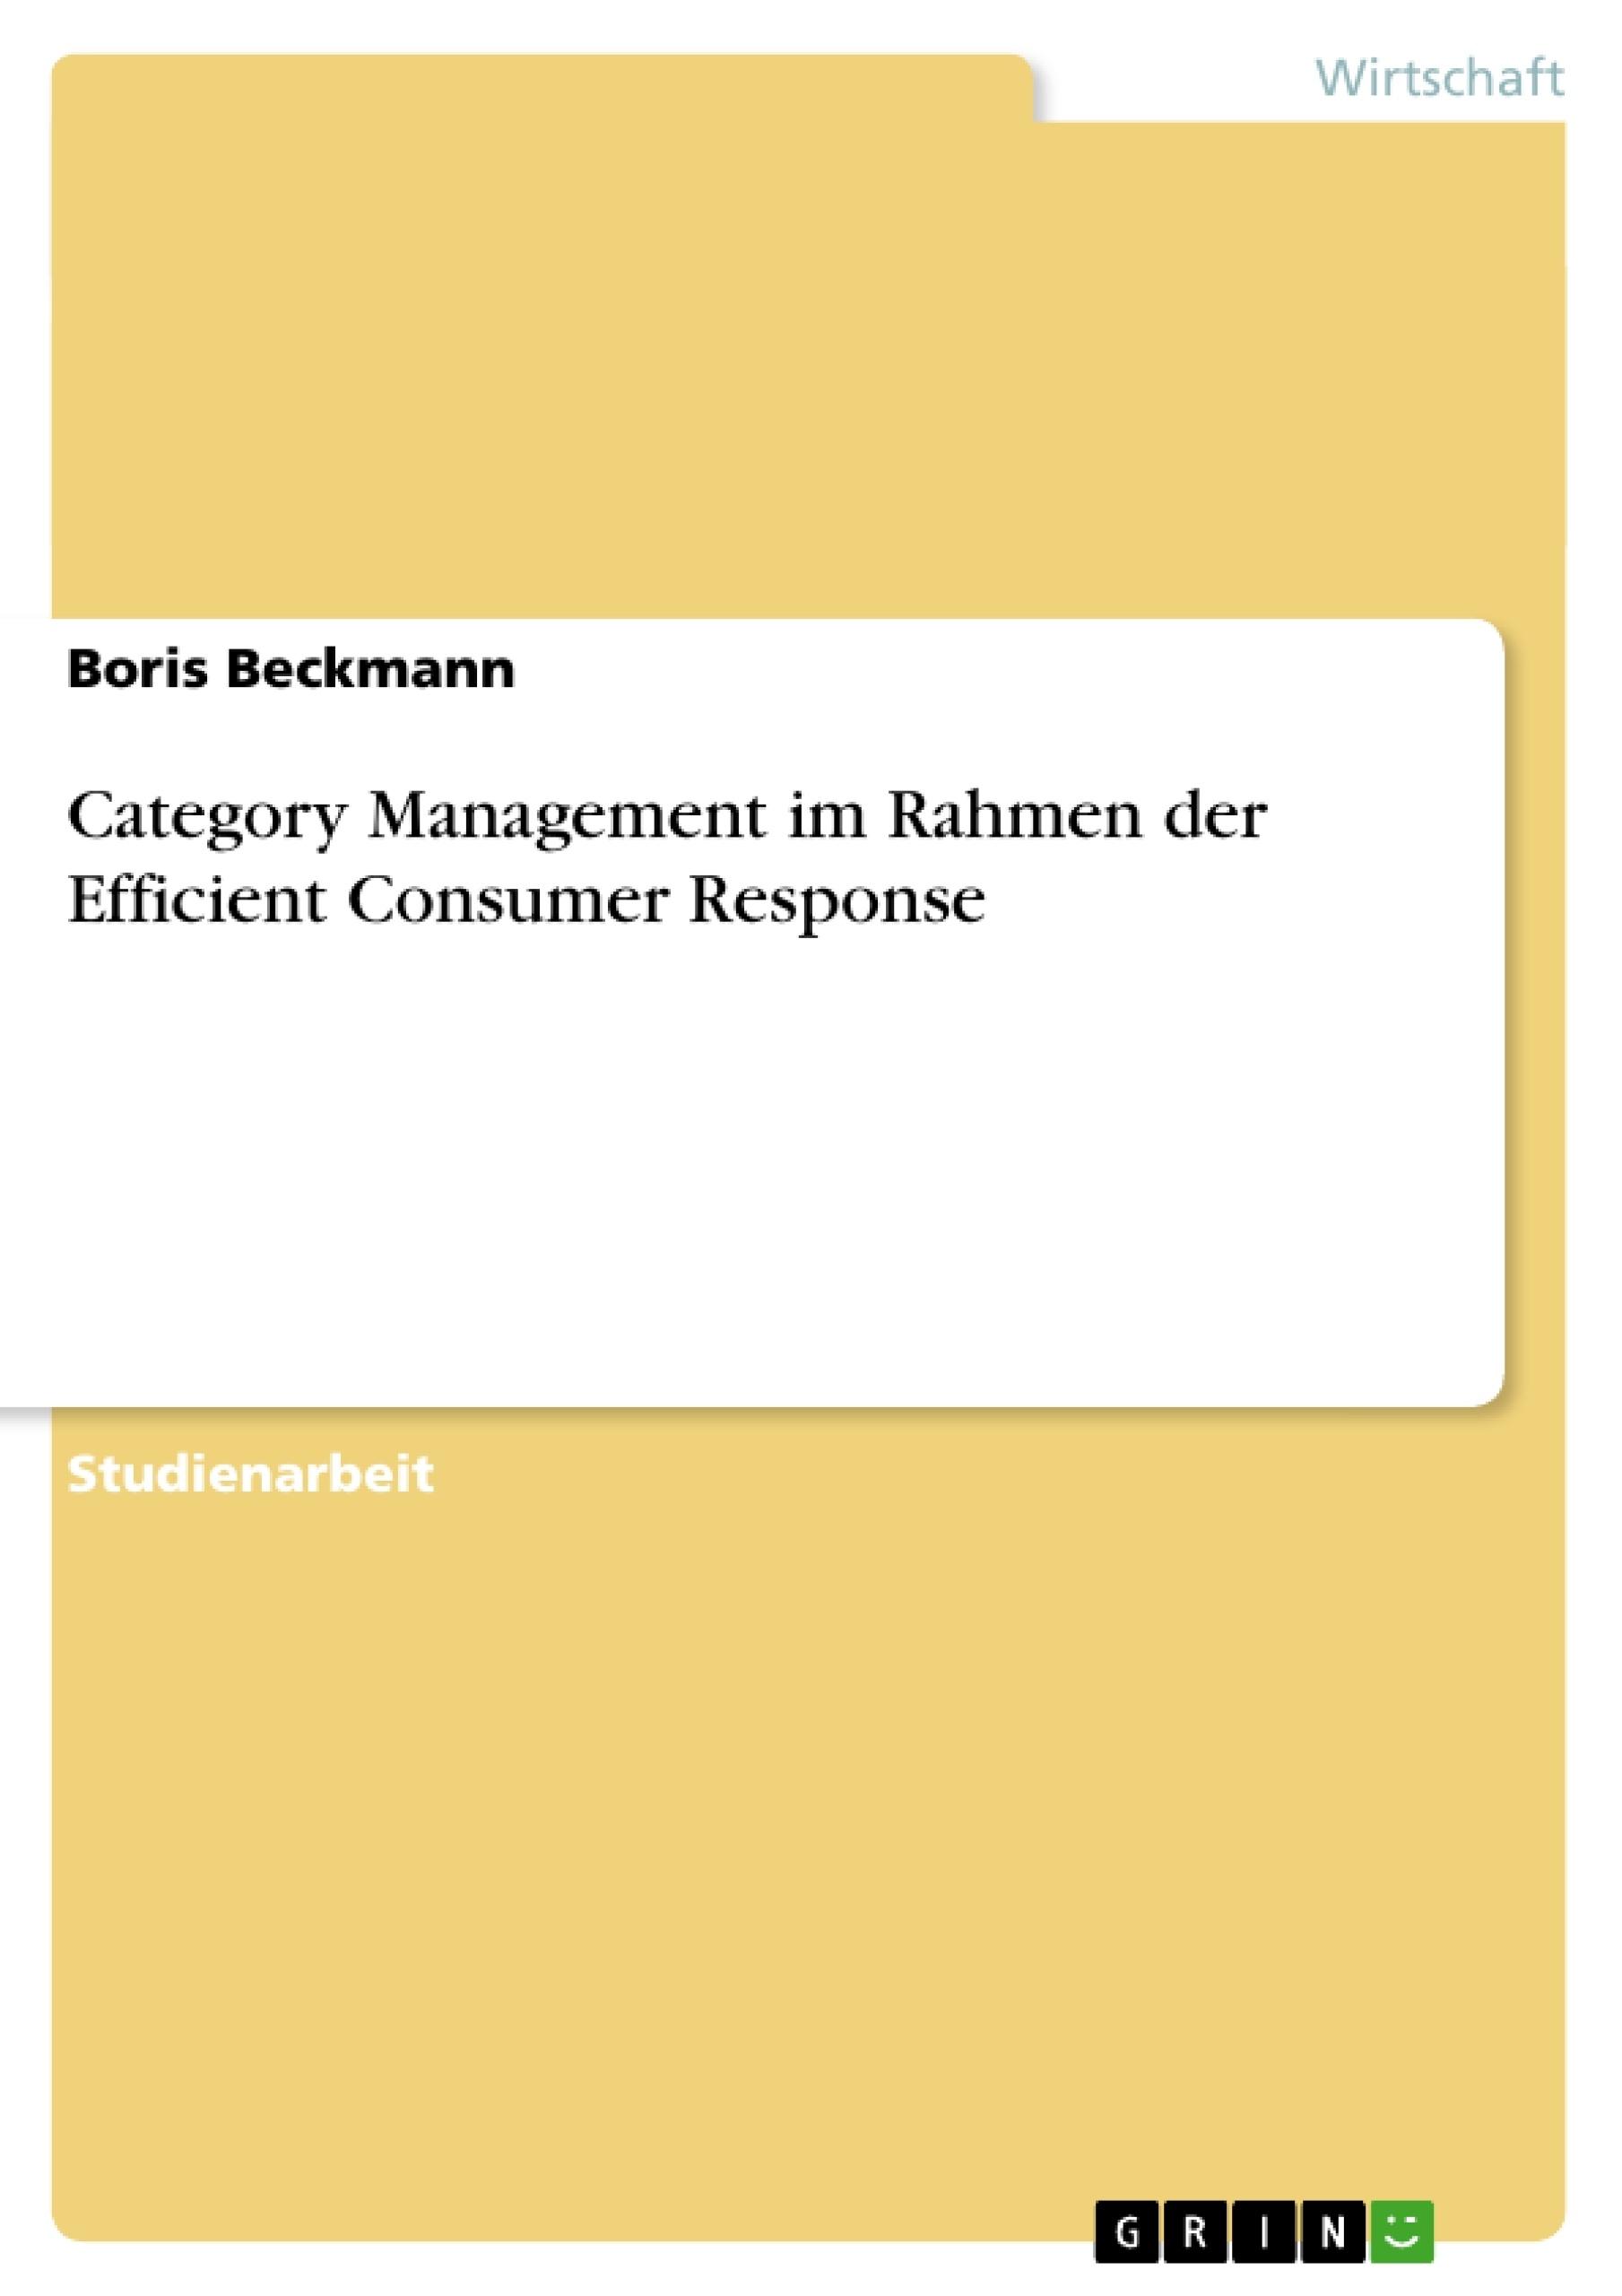 Titel: Category Management im Rahmen der Efficient Consumer Response